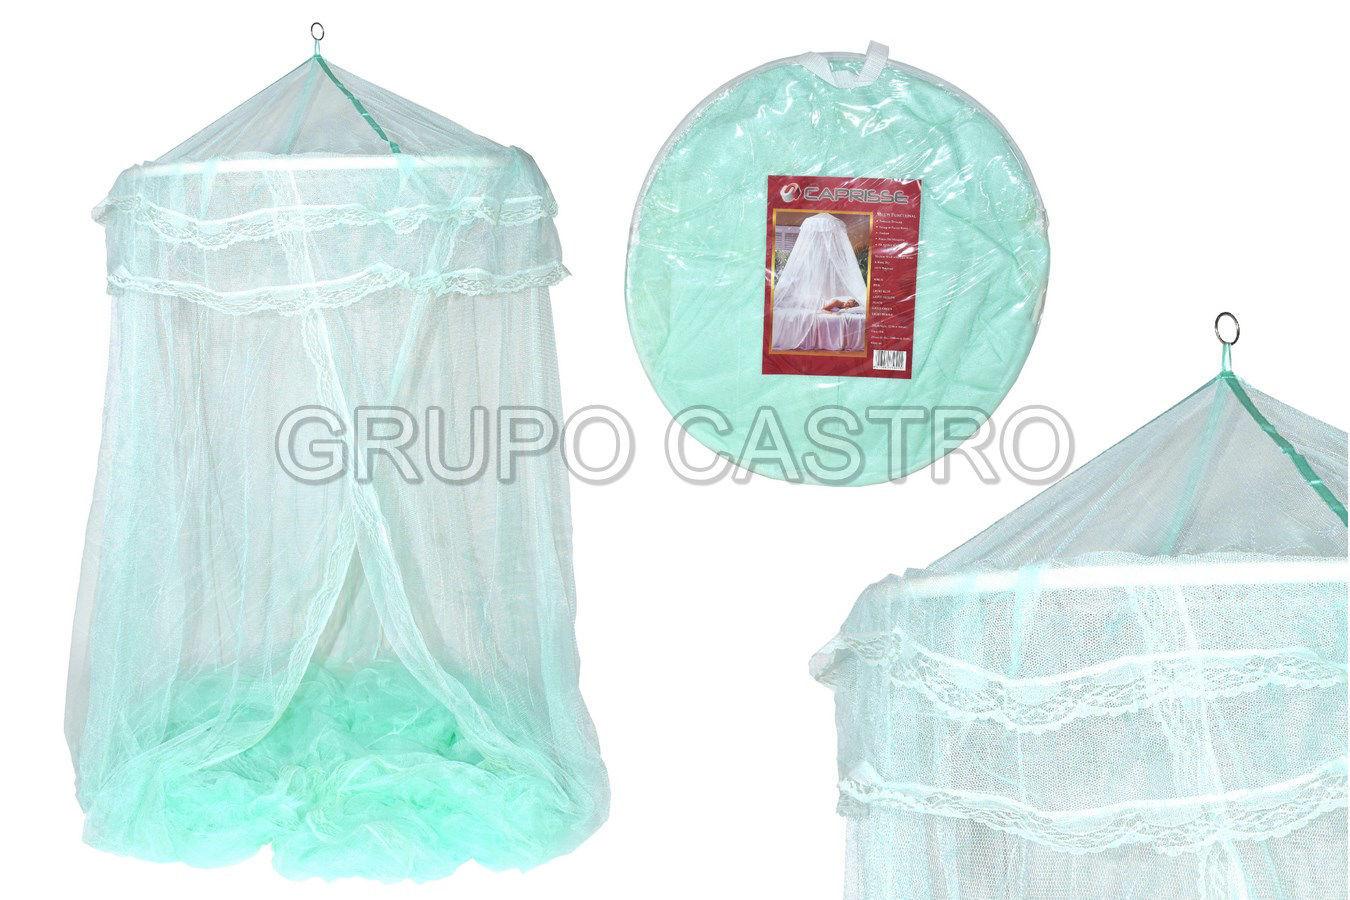 Foto de Toldo mosquitero matrimonial A8610-02 250x1200x60cms colores rueda king size caprisse